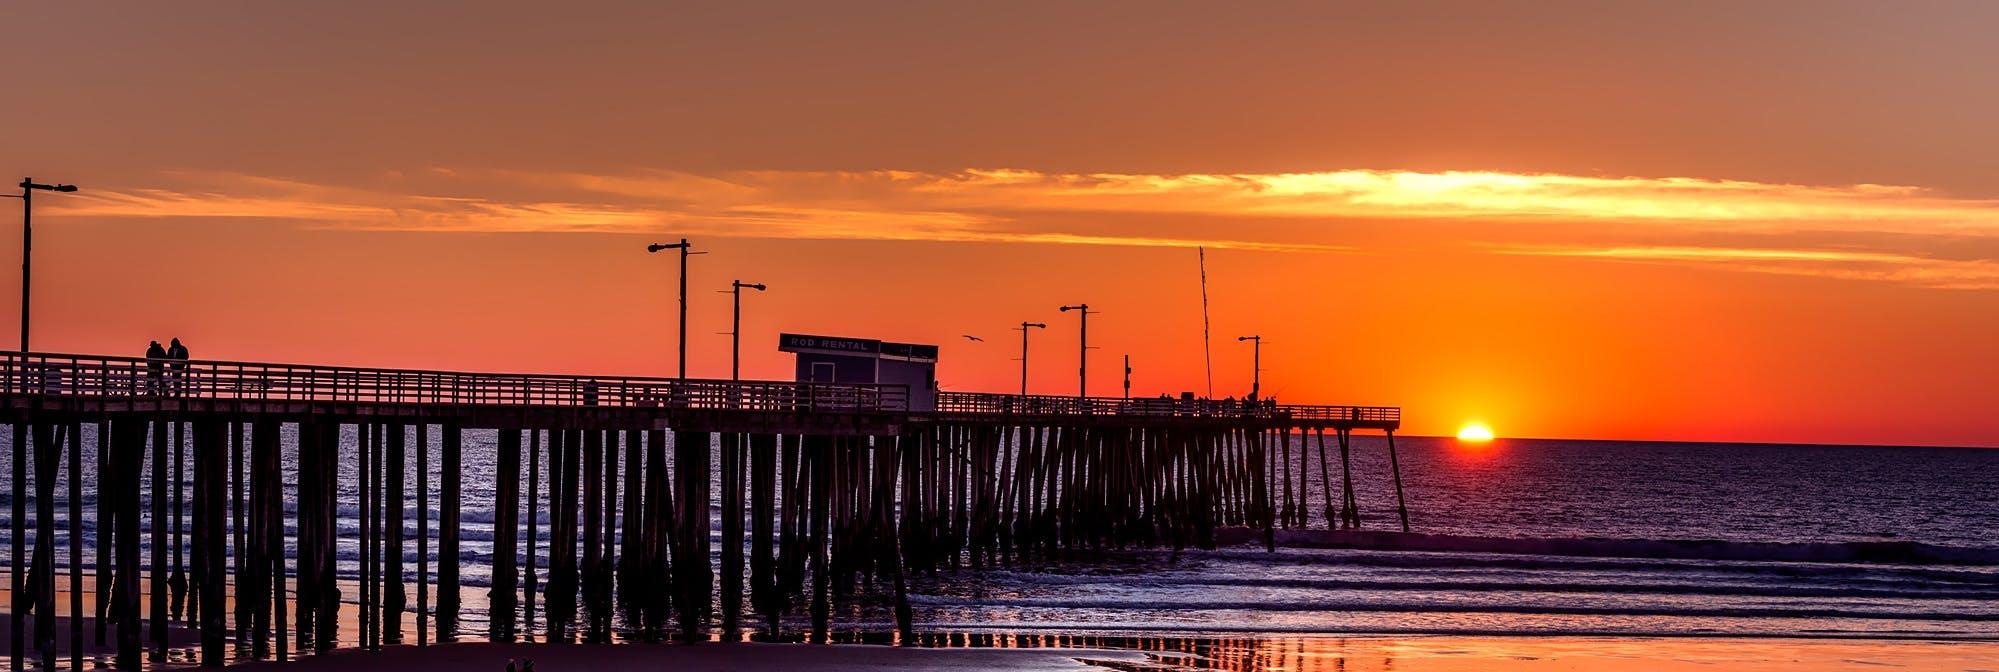 Silhouette of Boardwalk Near Body of Water Under Orange Sunset during Daytime